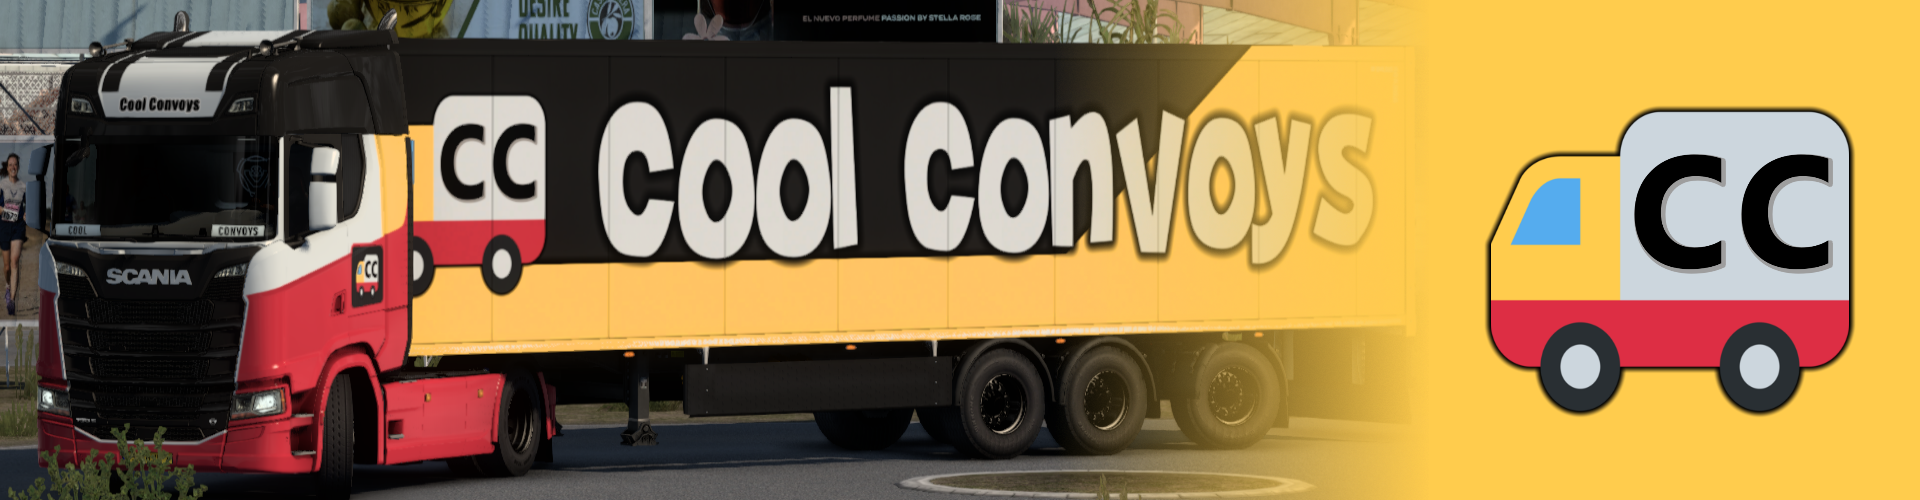 Cool Convoy #28